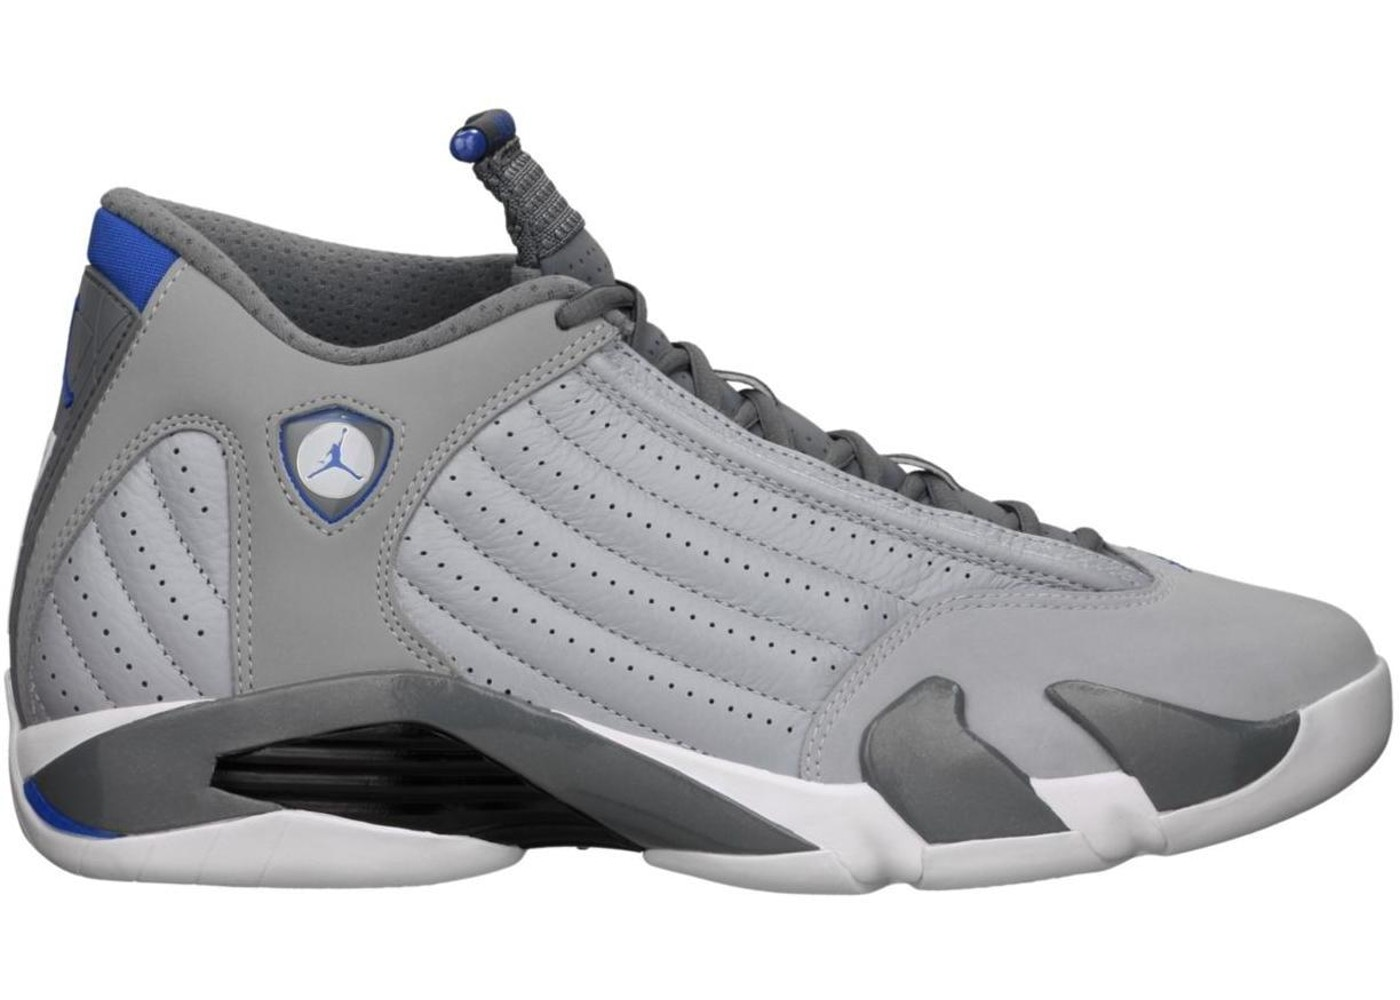 info for d8339 1d214 Buy Air Jordan 14 Shoes & Deadstock Sneakers